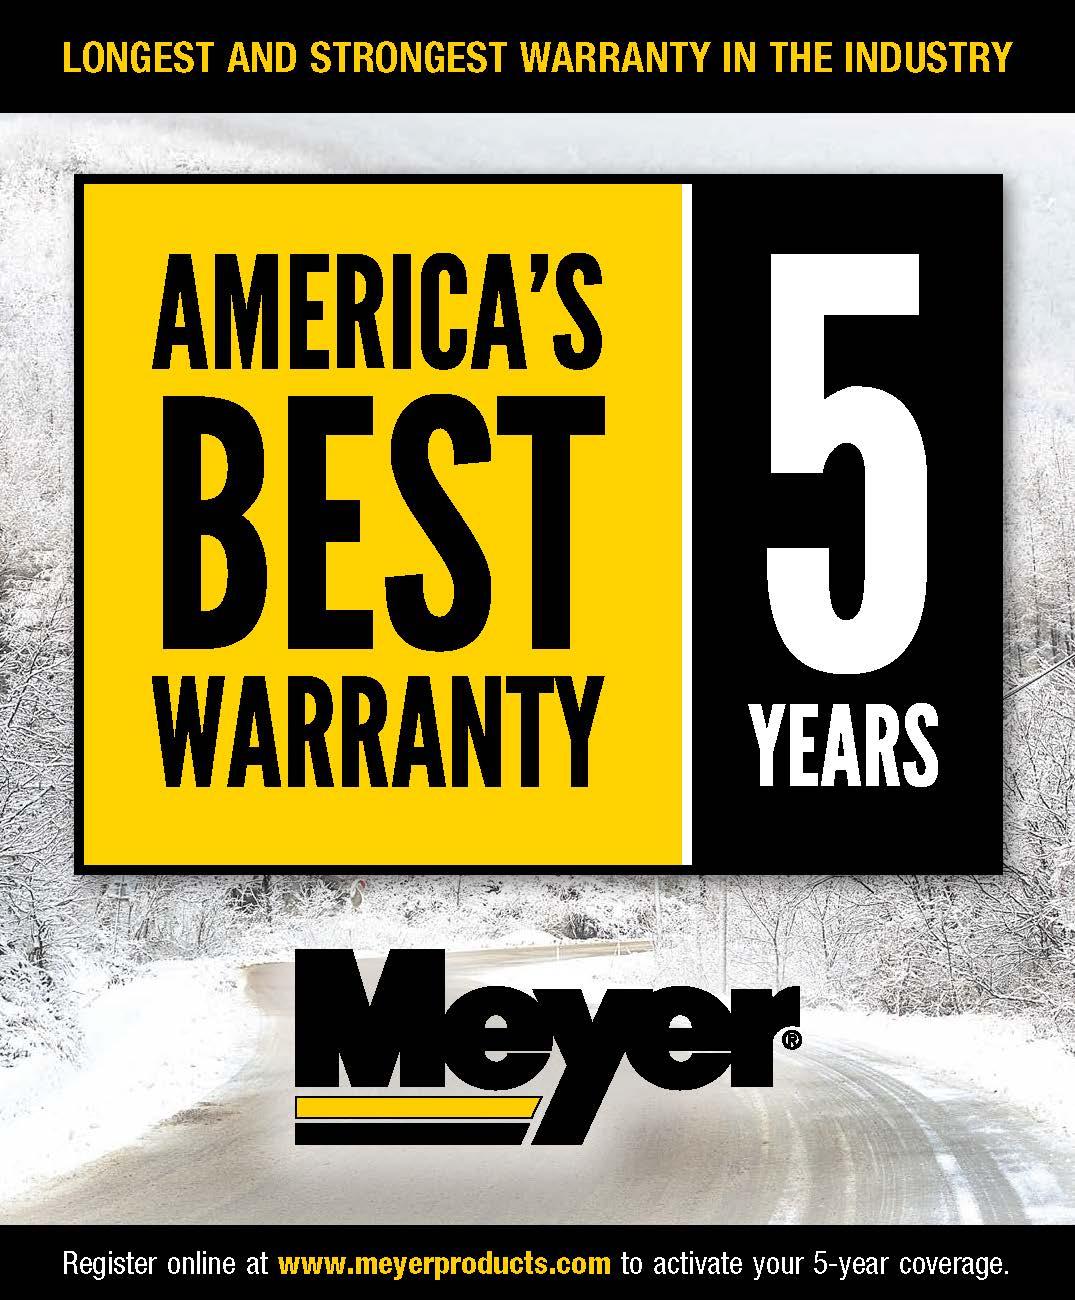 Meyer Plow Warranty Wiring Diagrams Harness New Old We Know Cleveland Snow Plows Jti Inc Rh Trailerandhitchexperts Com Meyers Troubleshooting